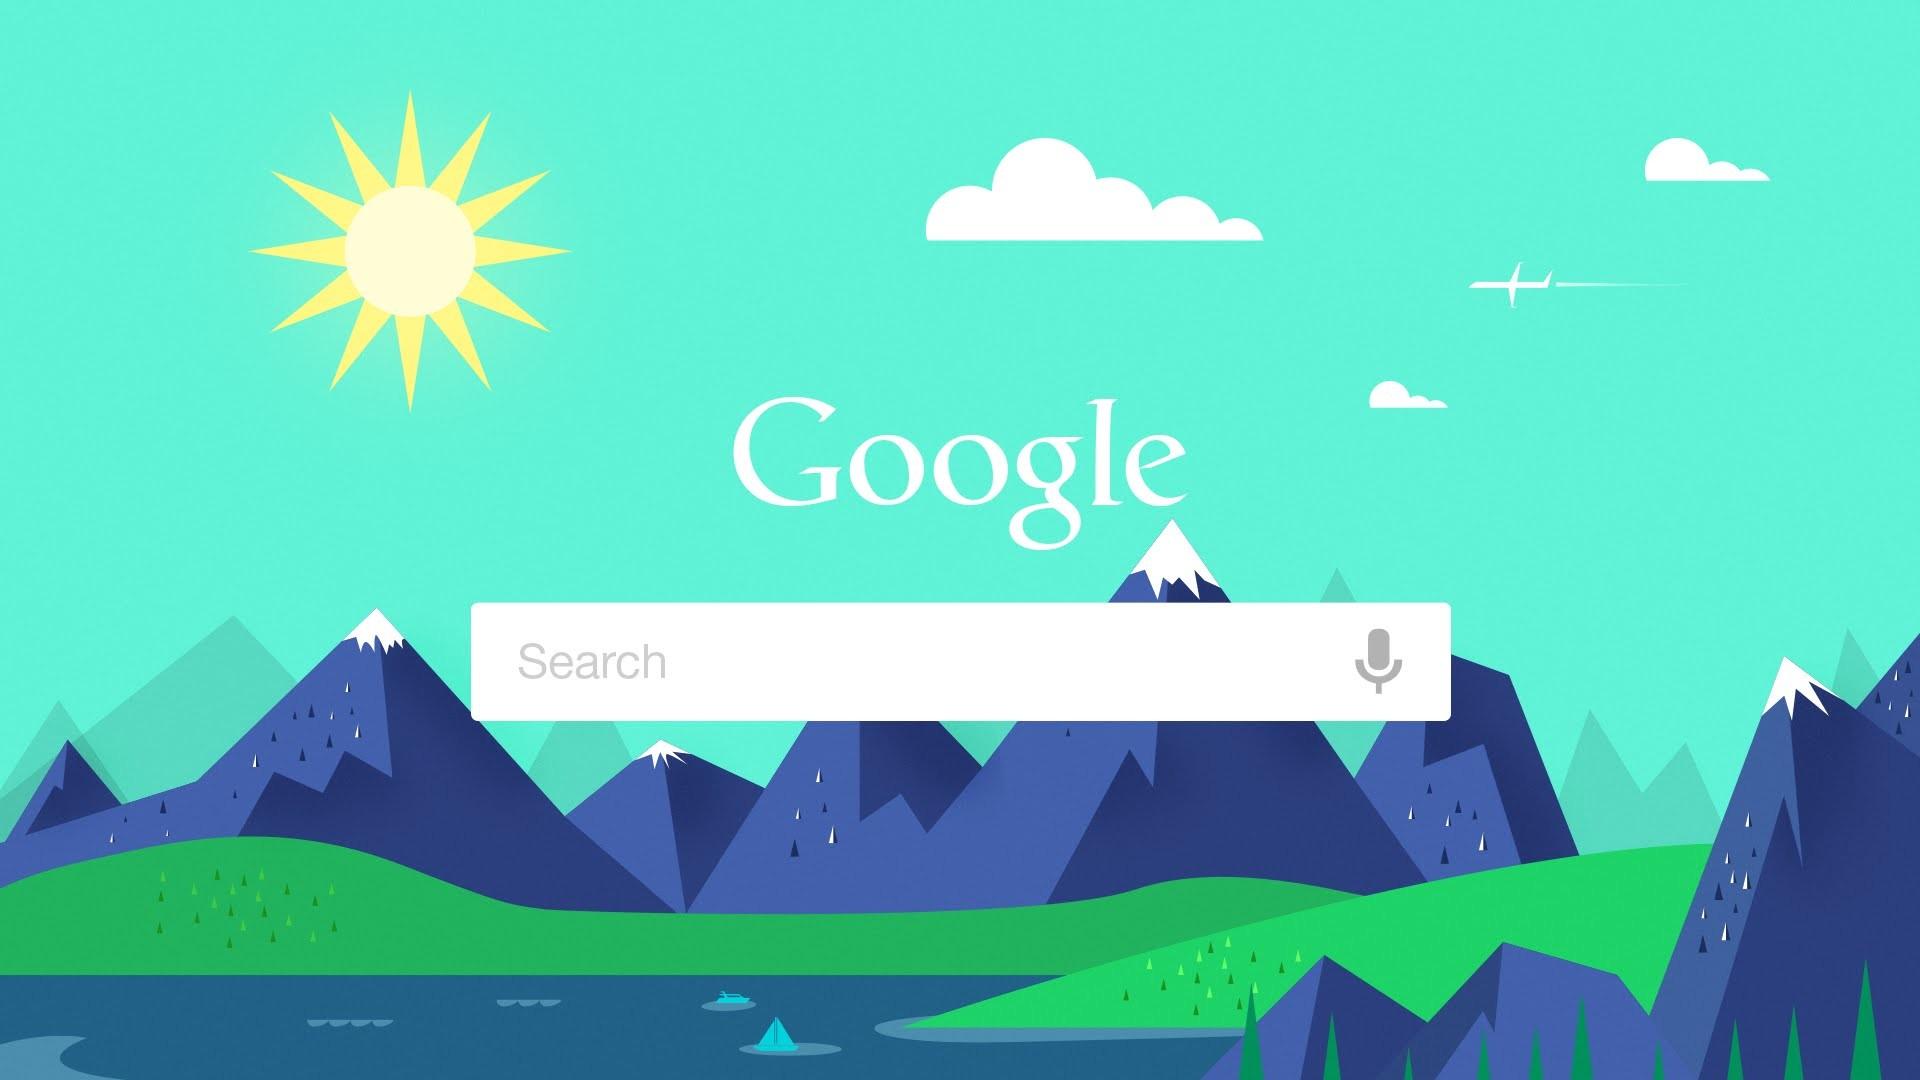 Illustrator Tutorial – Flat Design Summer Wallpaper (Google Now) – YouTube